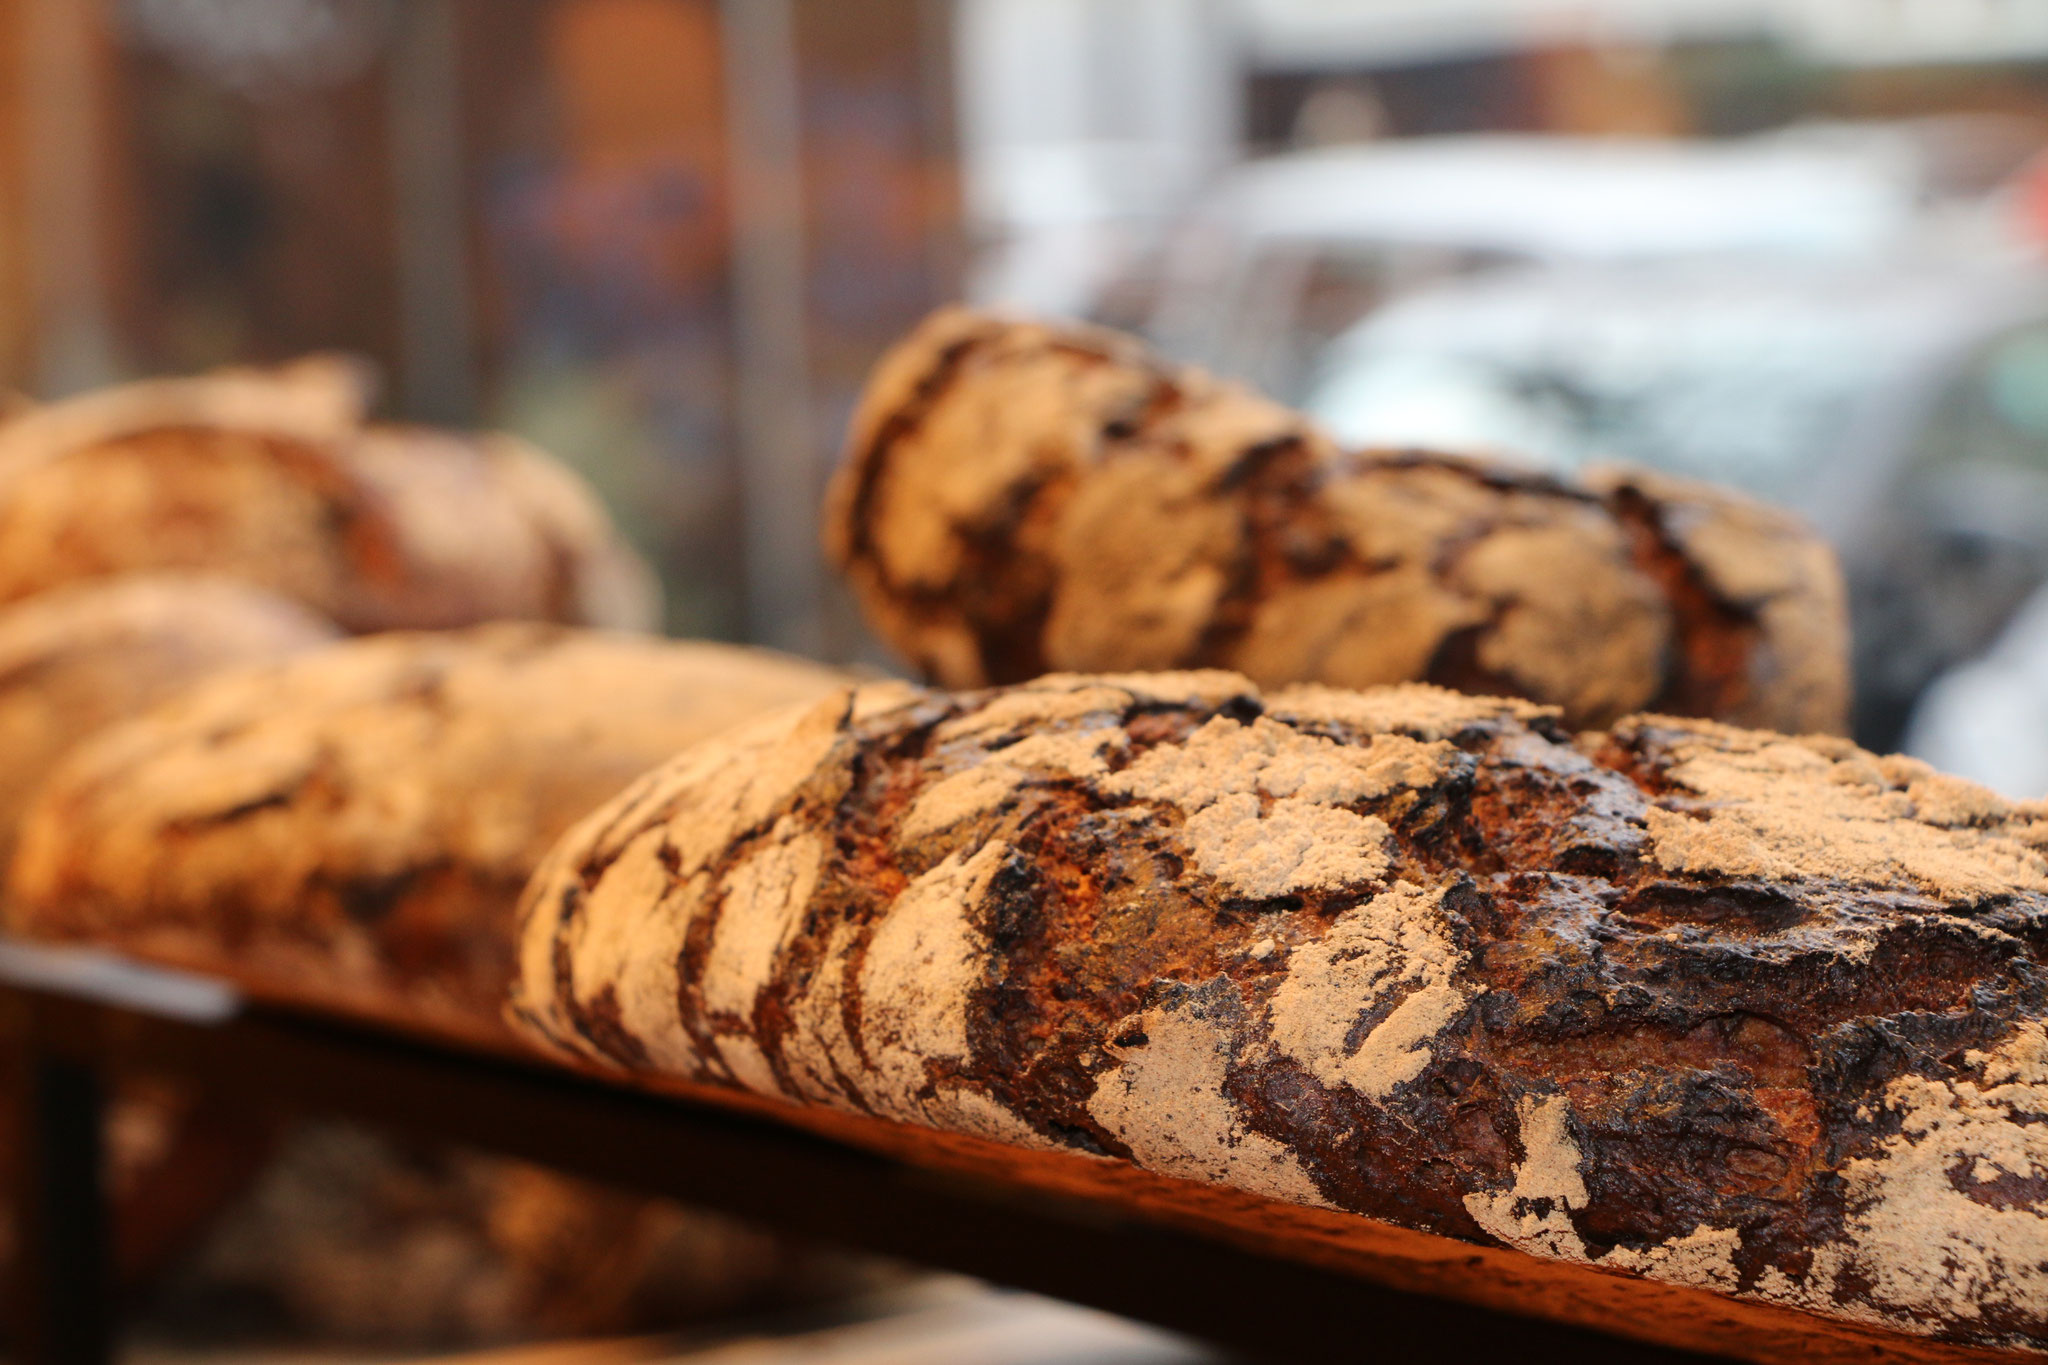 40 verschiedene Brot- und Backwaren